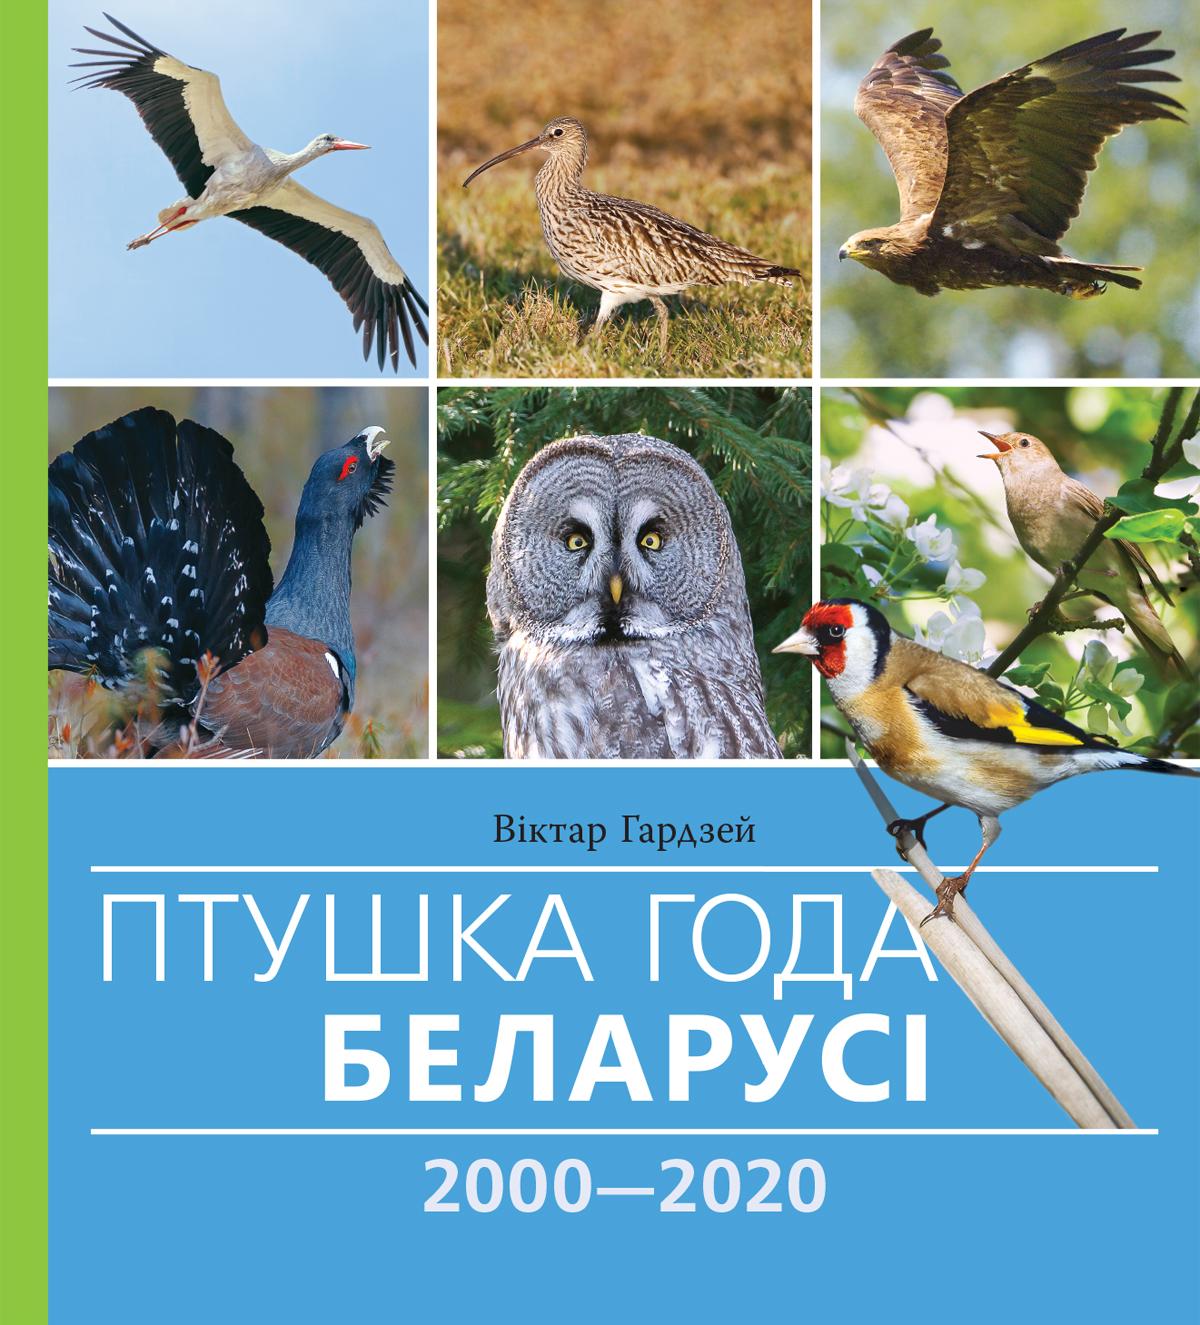 Птушка года Беларусі 2000—2020